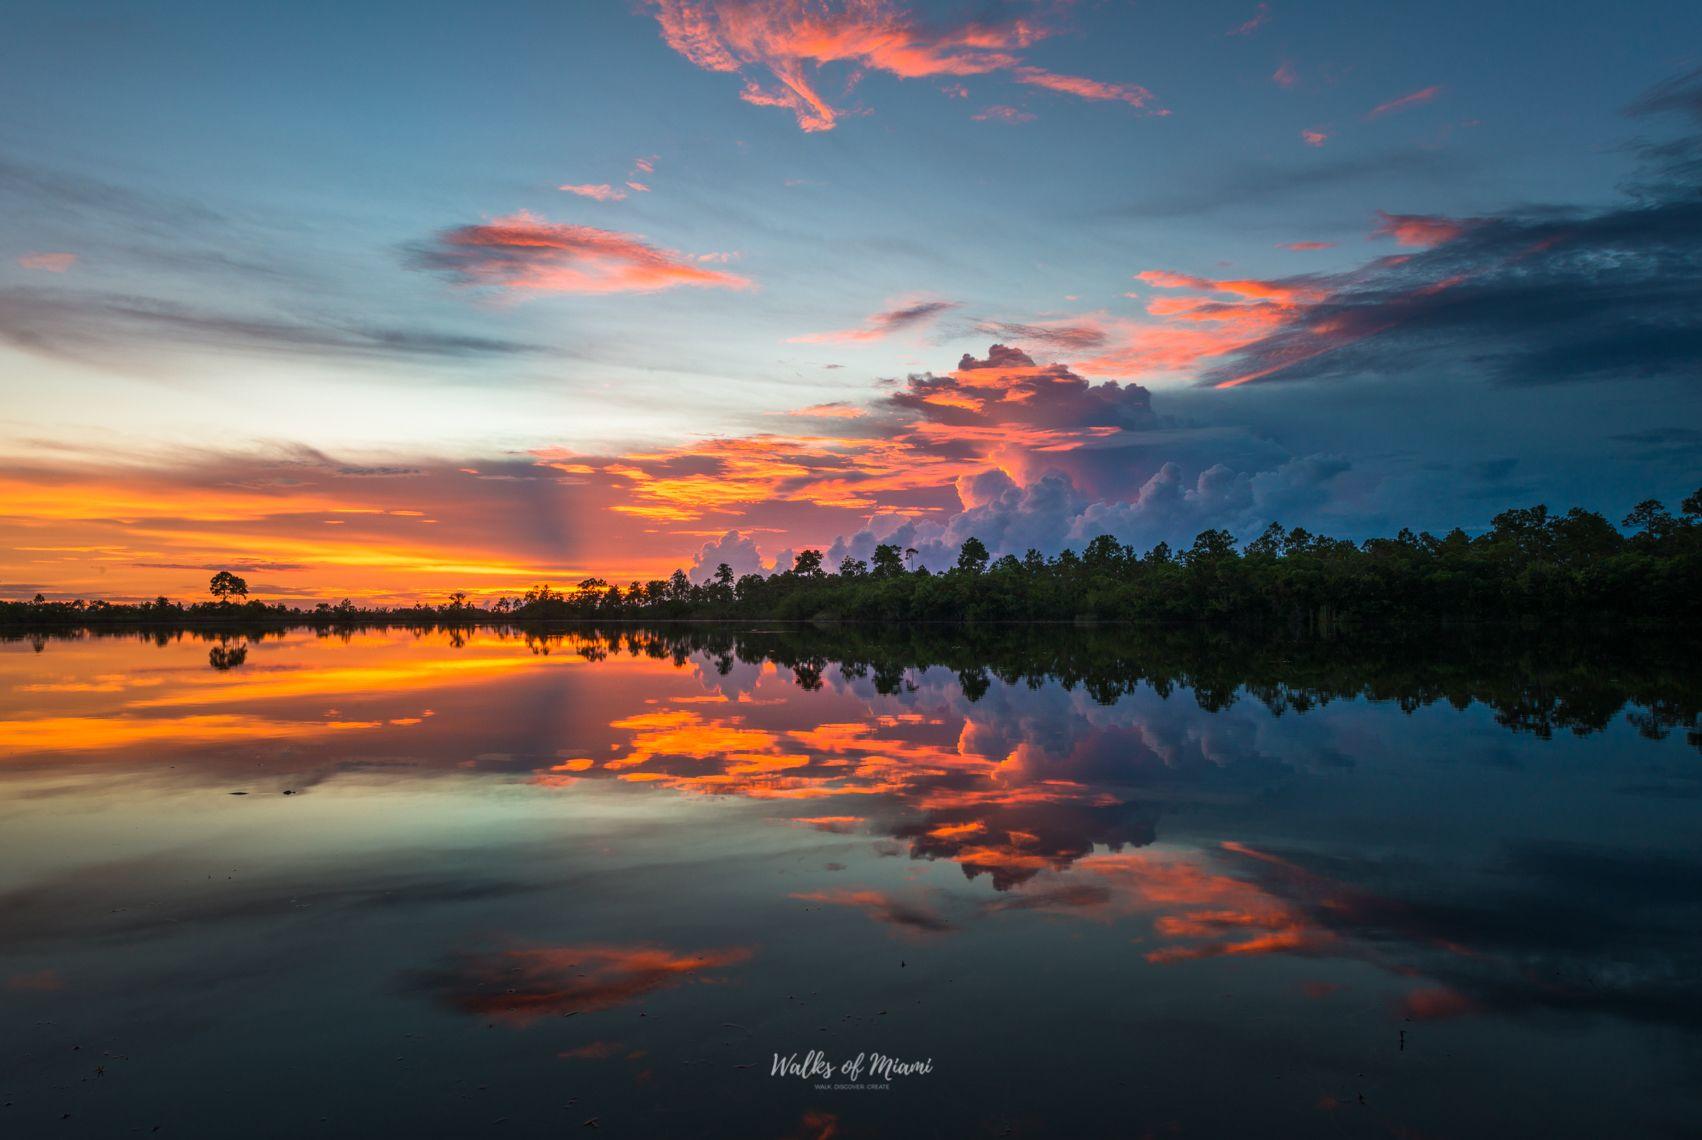 Sunset views of Everglades National Park